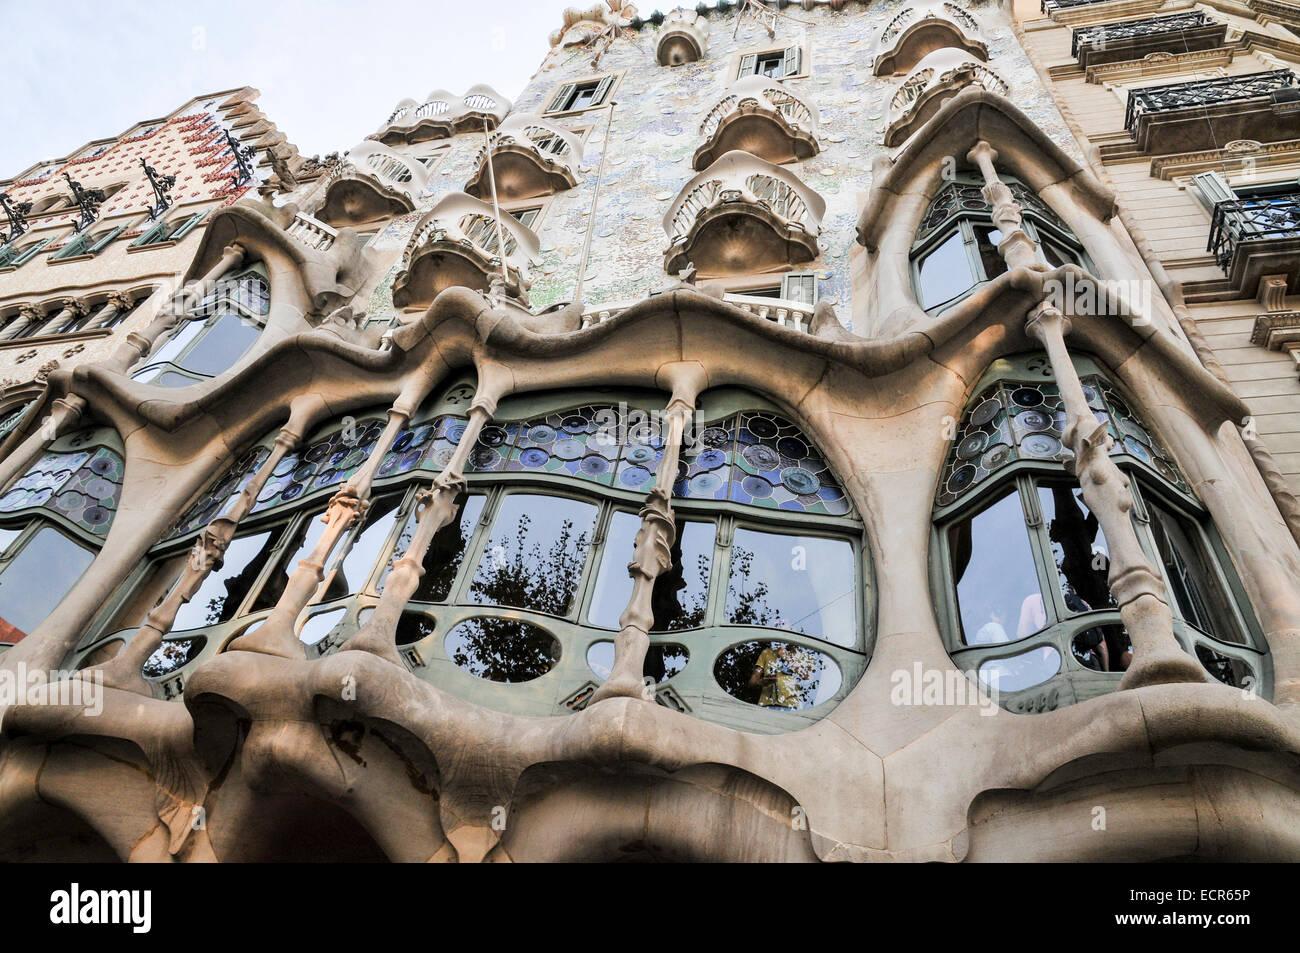 Spain, Barcelona, Casa Mila (La Pedrera) by the architect Antoni Gaudi - Stock Image